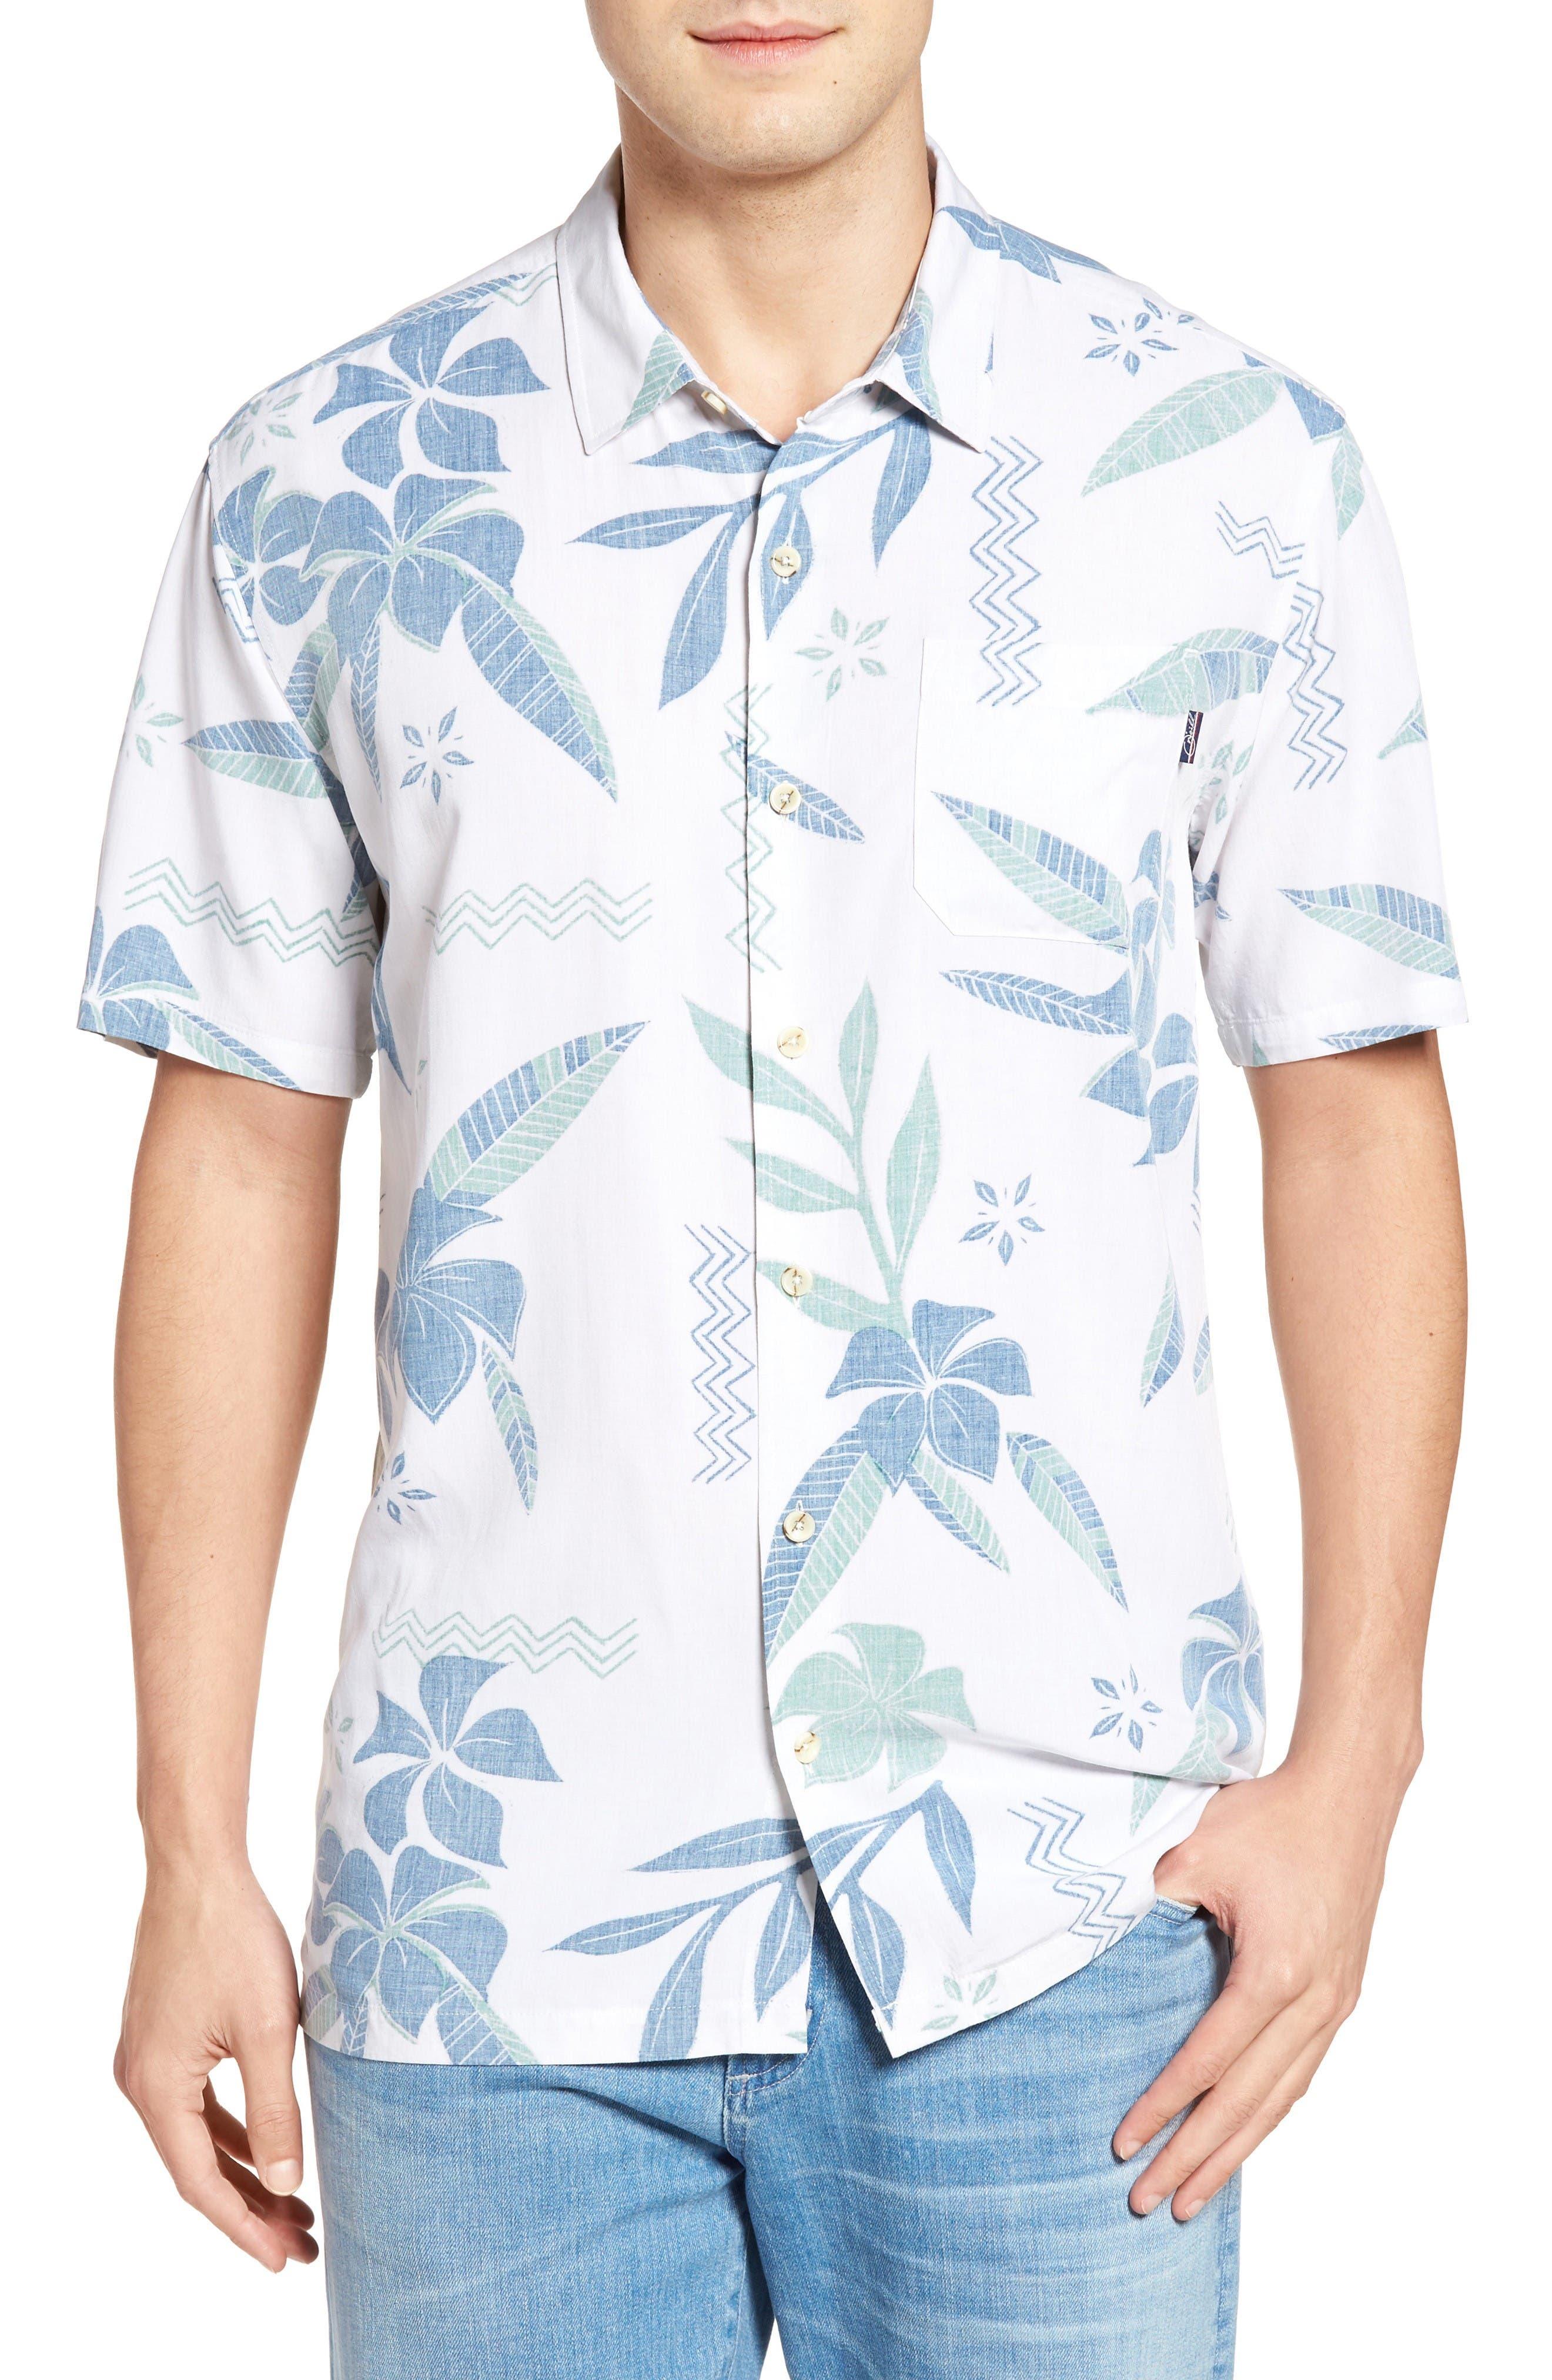 Miramar Woven Shirt,                         Main,                         color, White